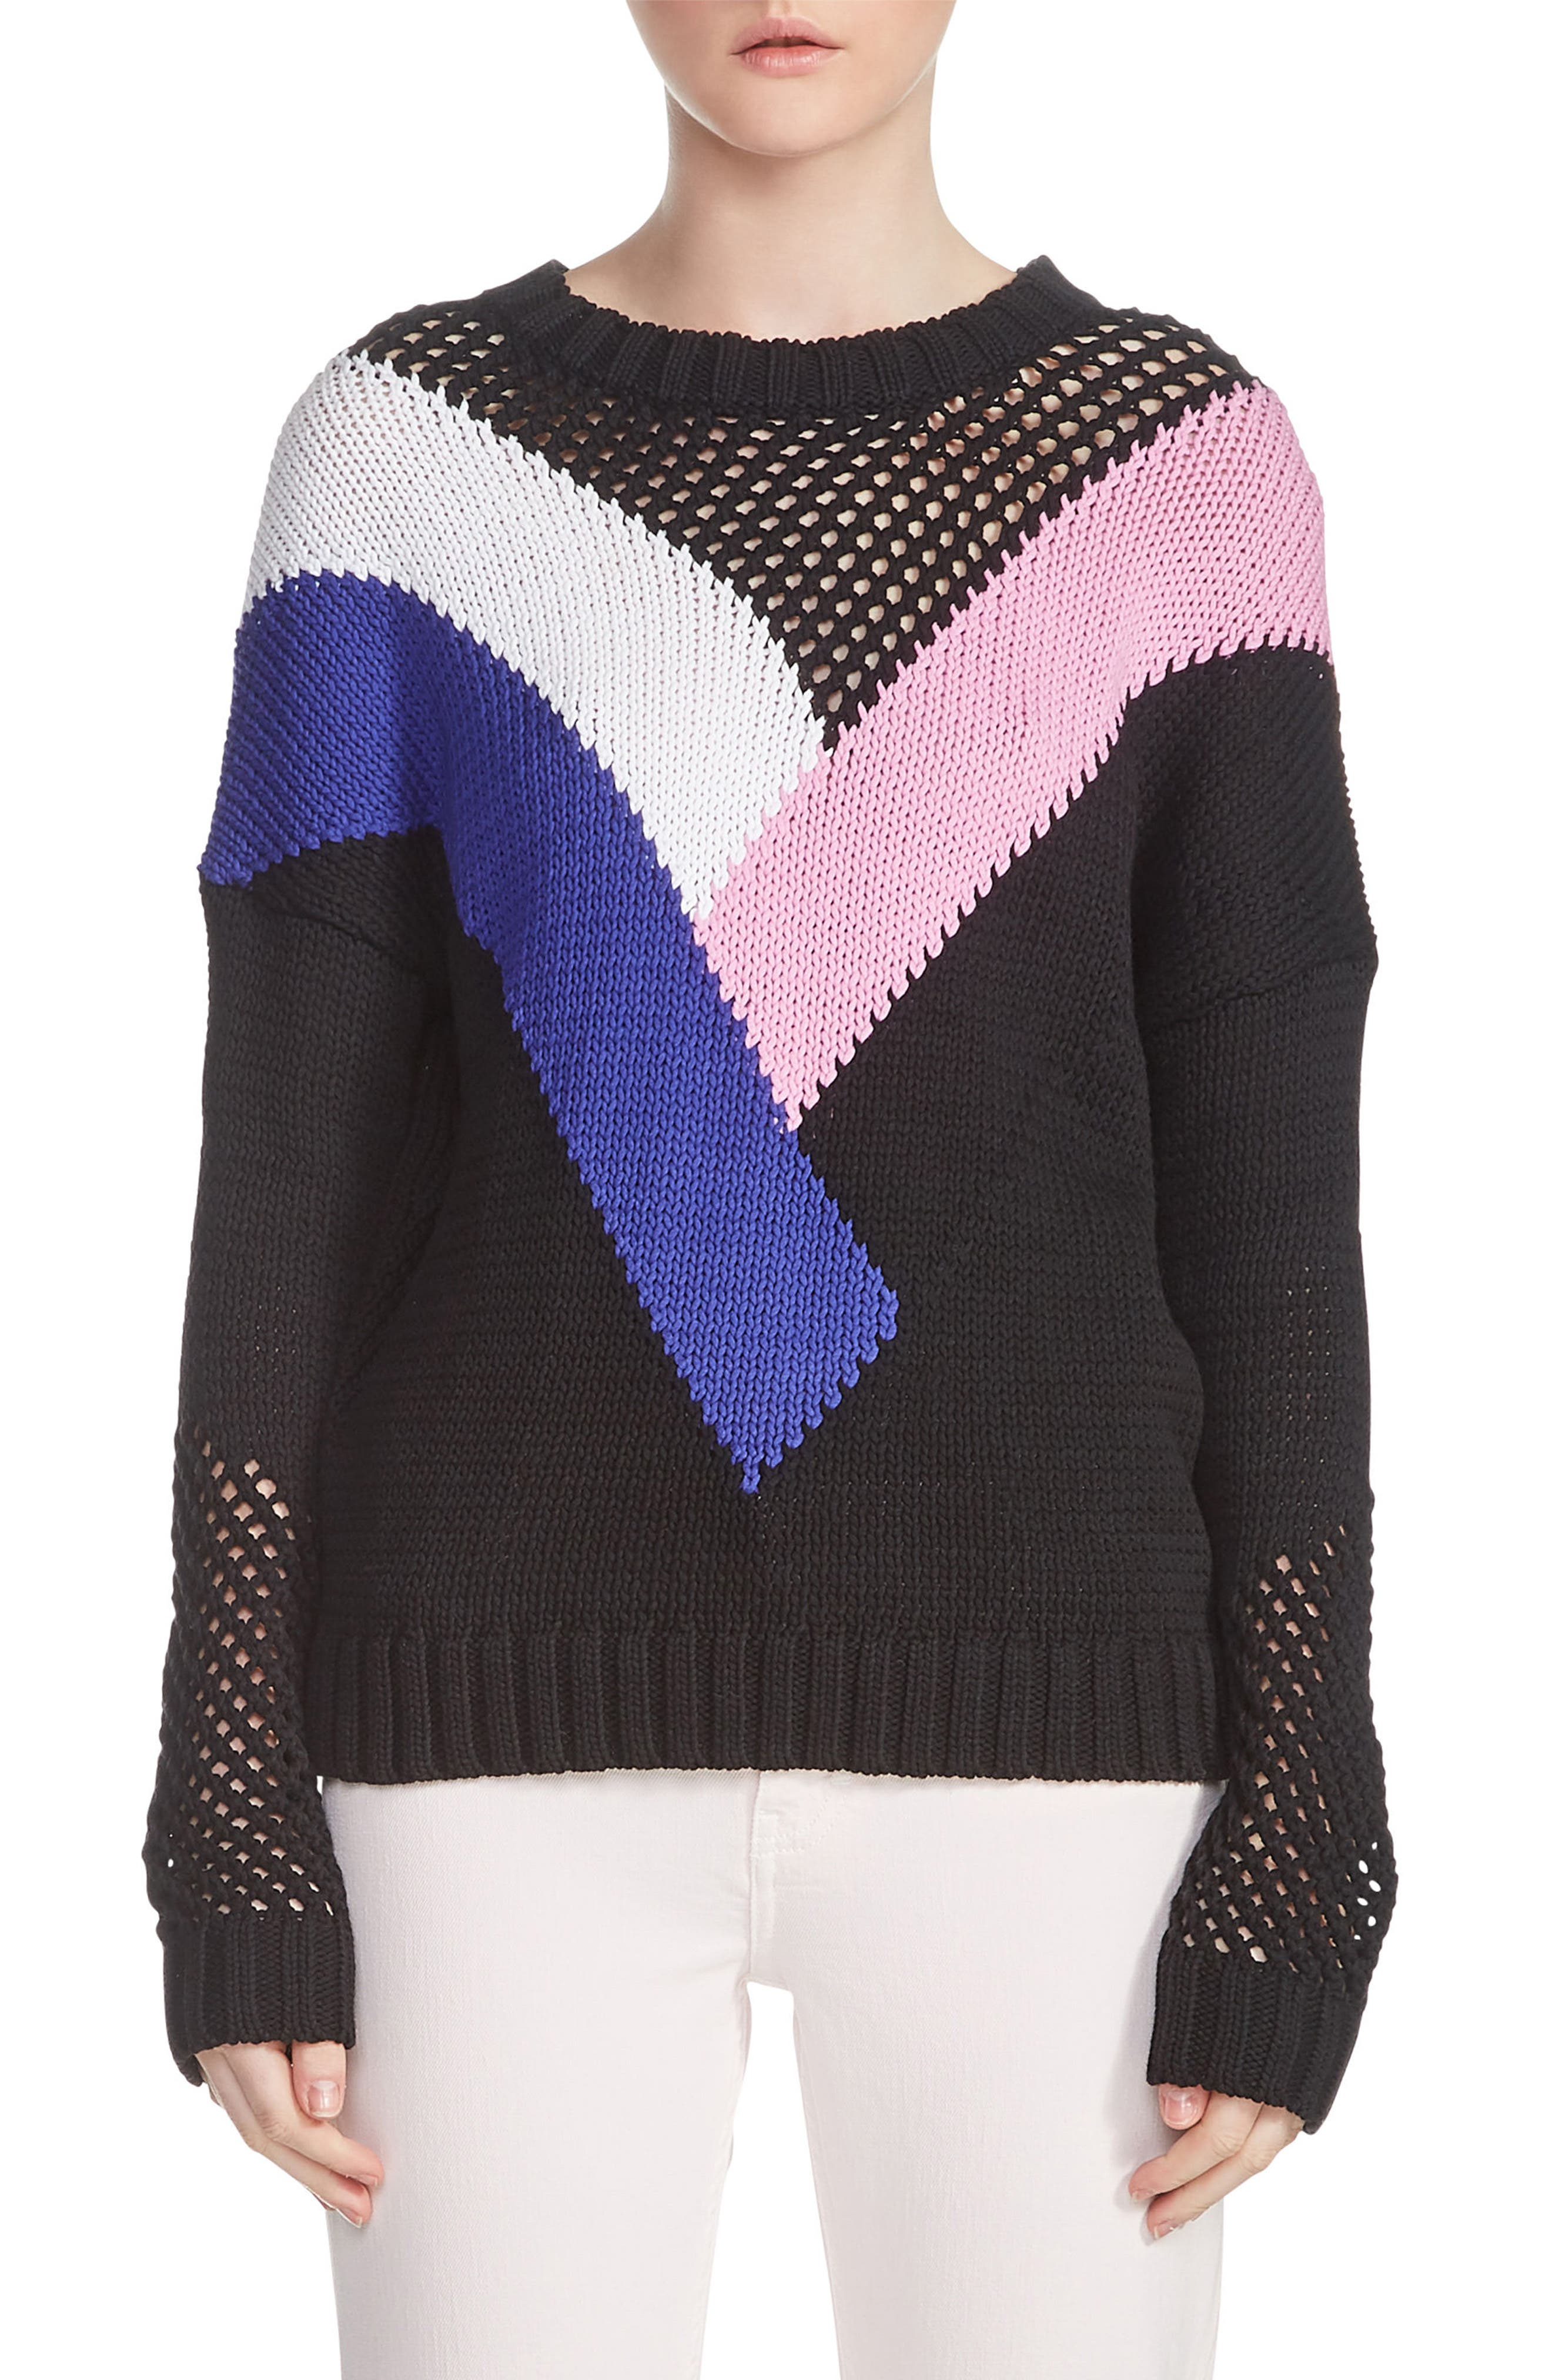 Marylene Sweater,                         Main,                         color, 001